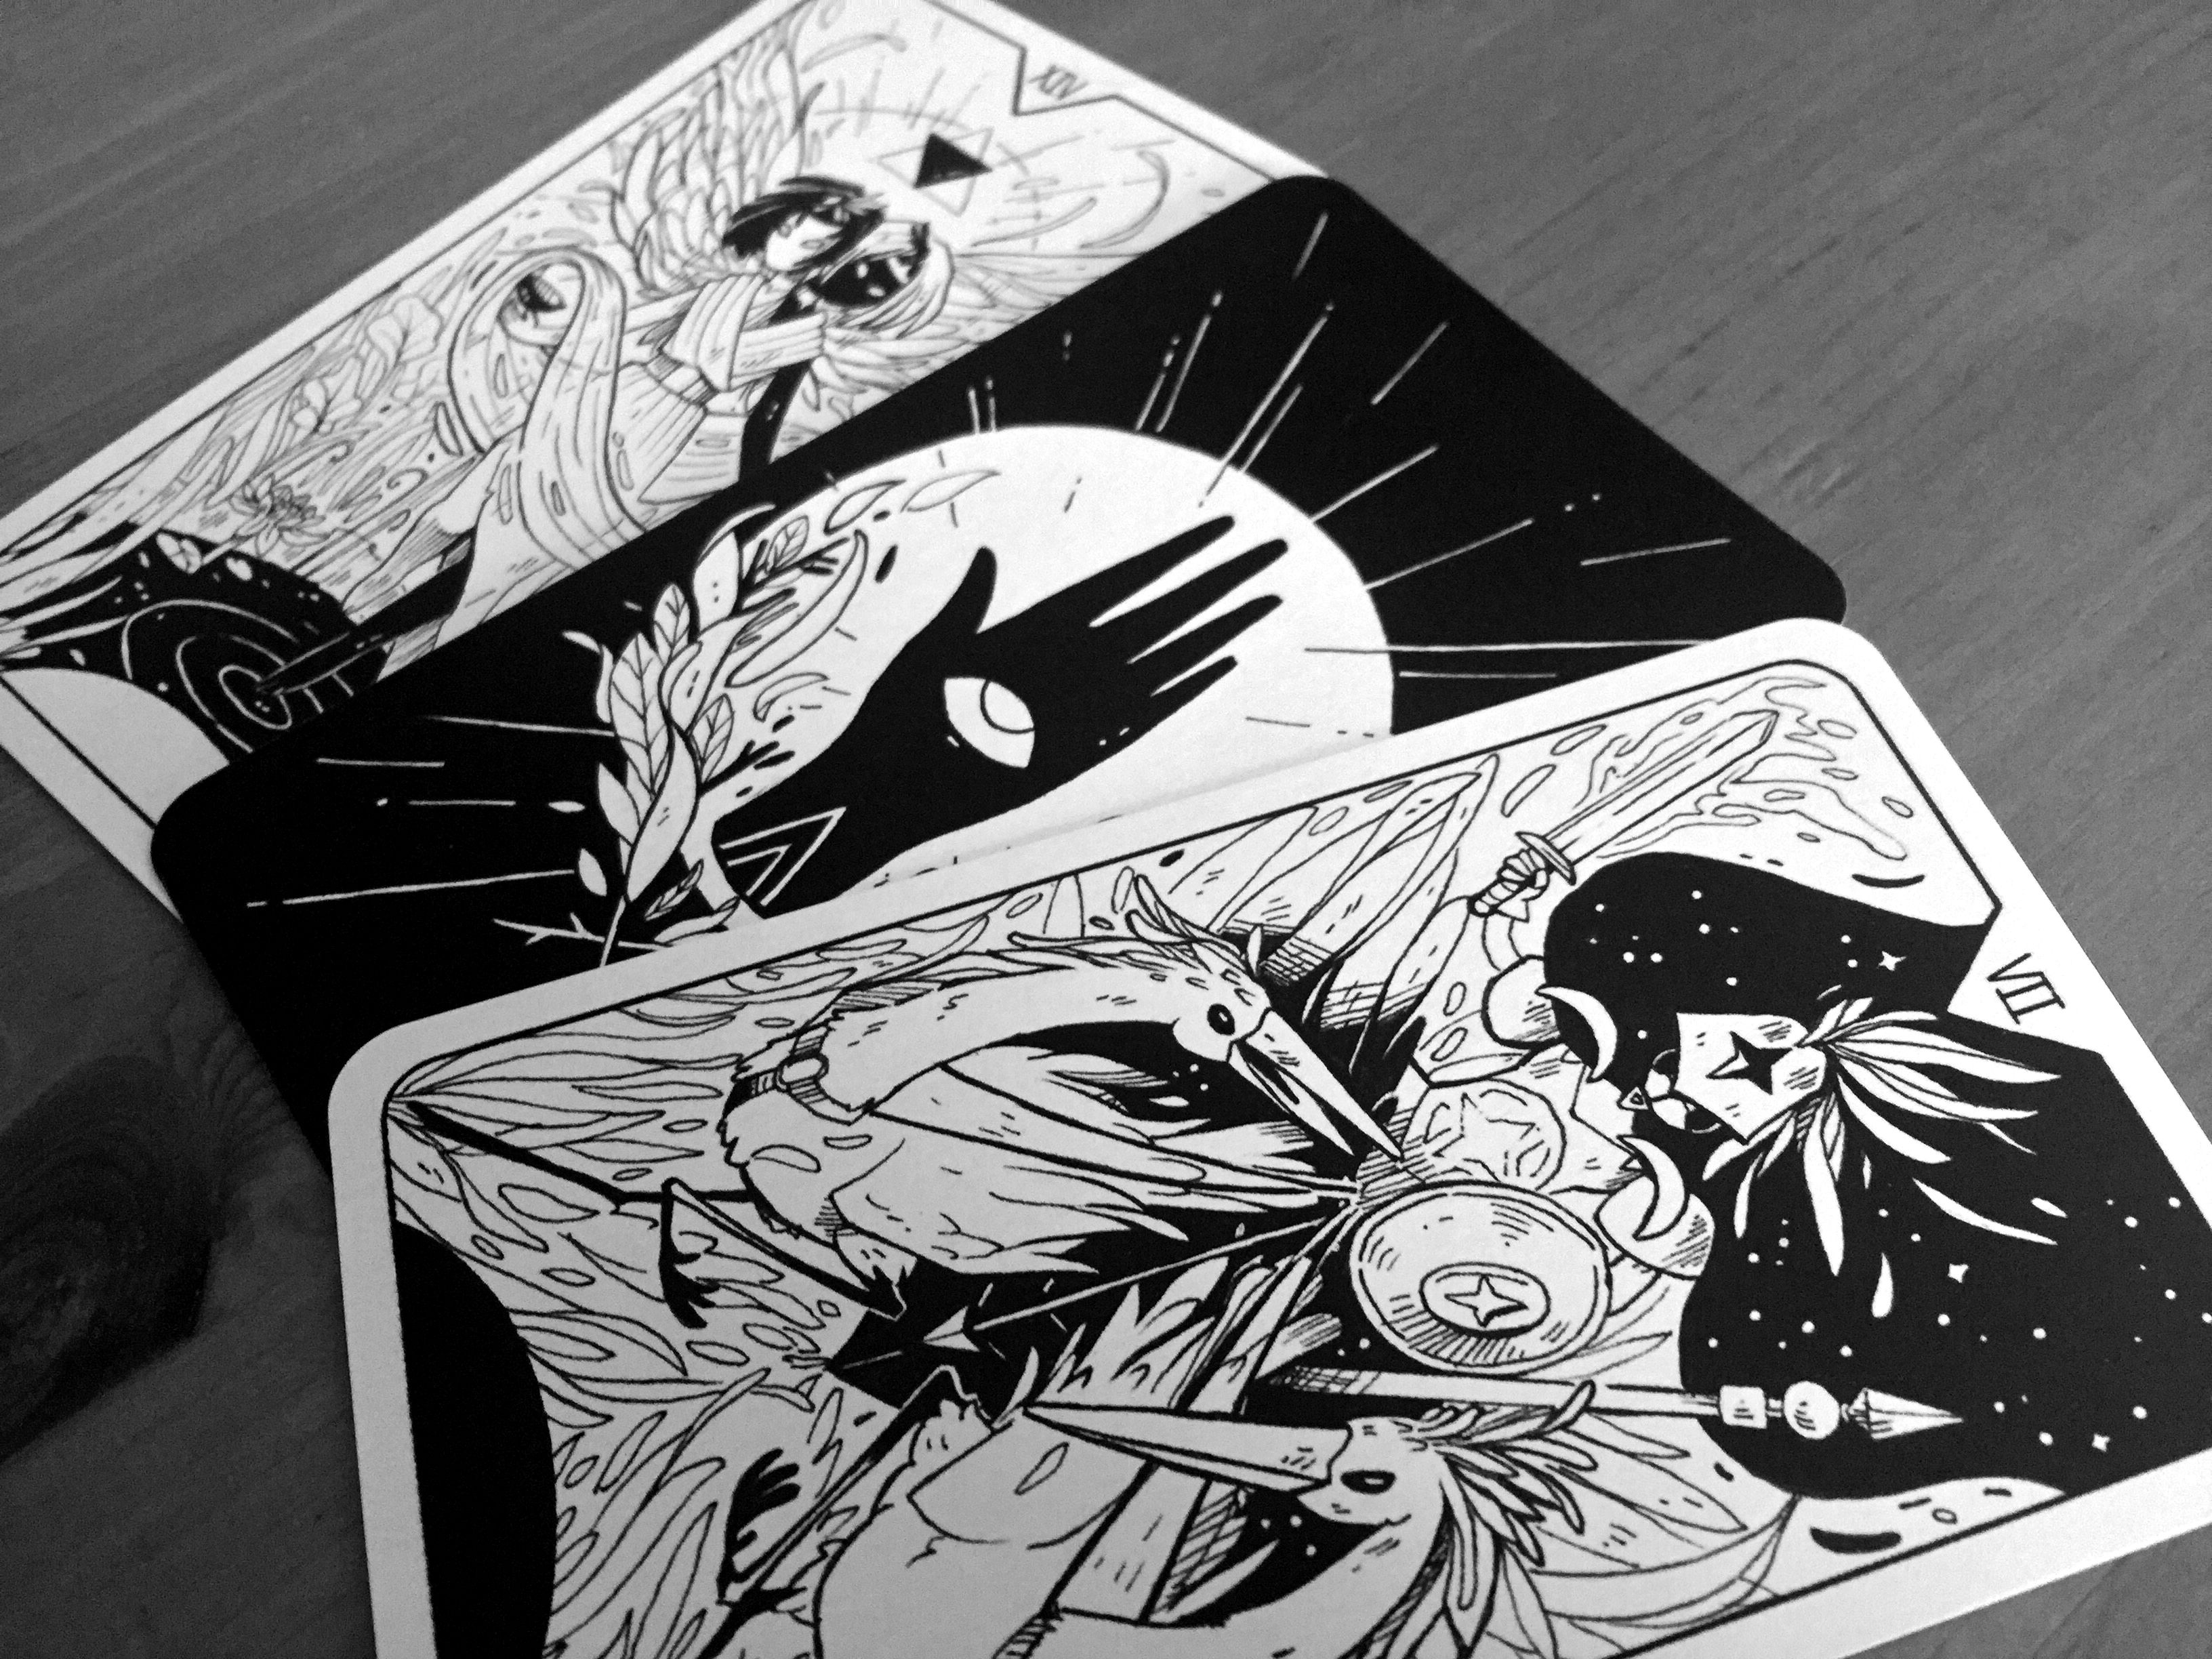 Major arcana dziff major arcana playing cards design art